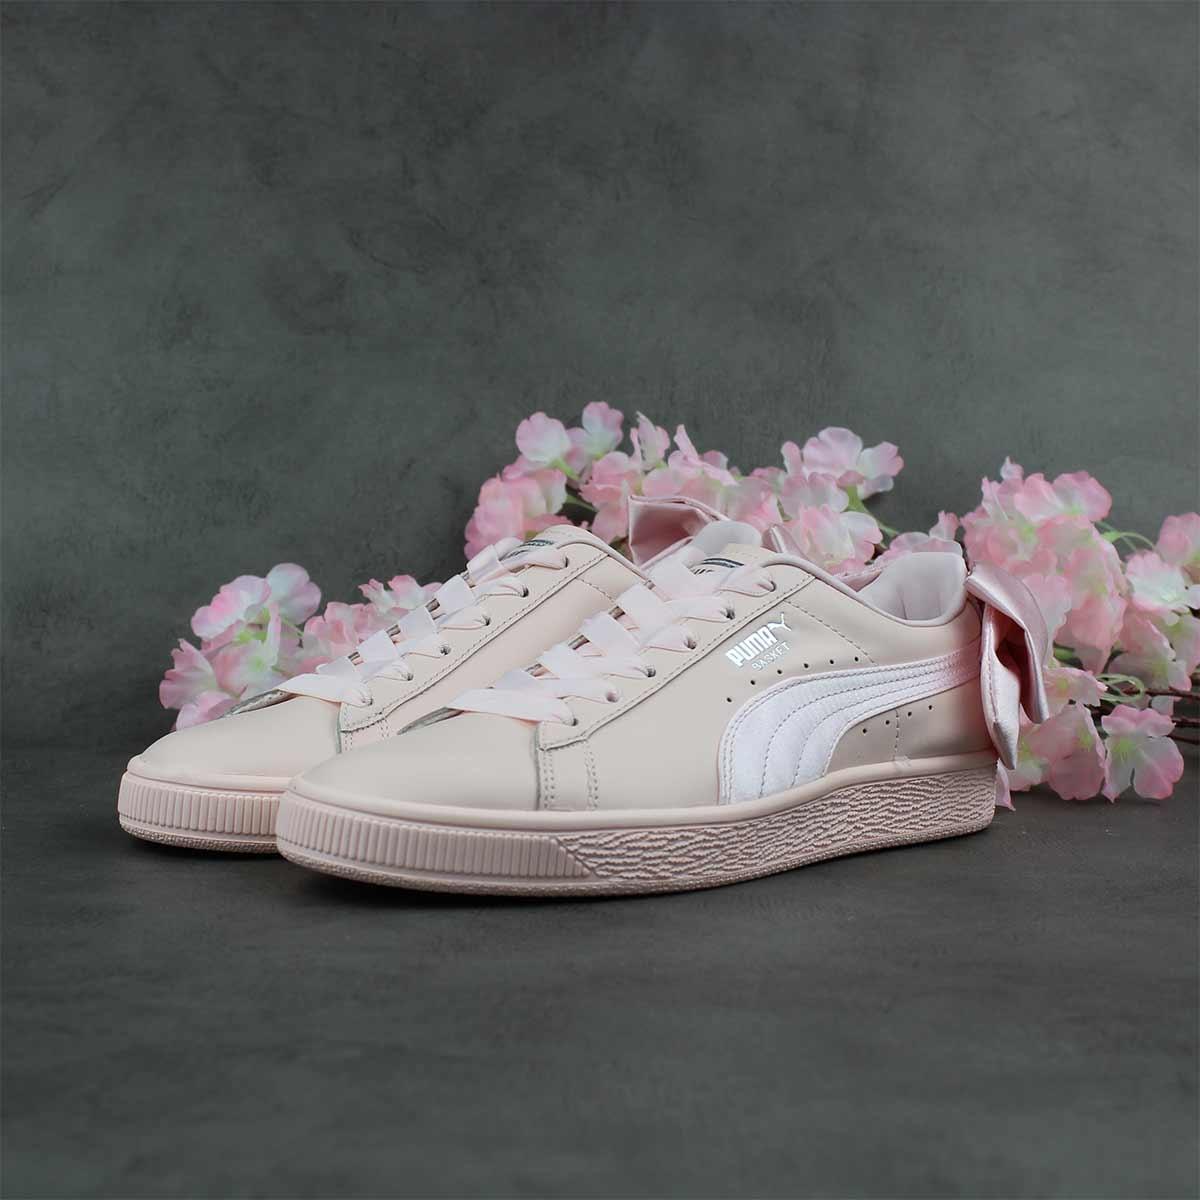 Puma Basket Bow W (Rose) 367319-02